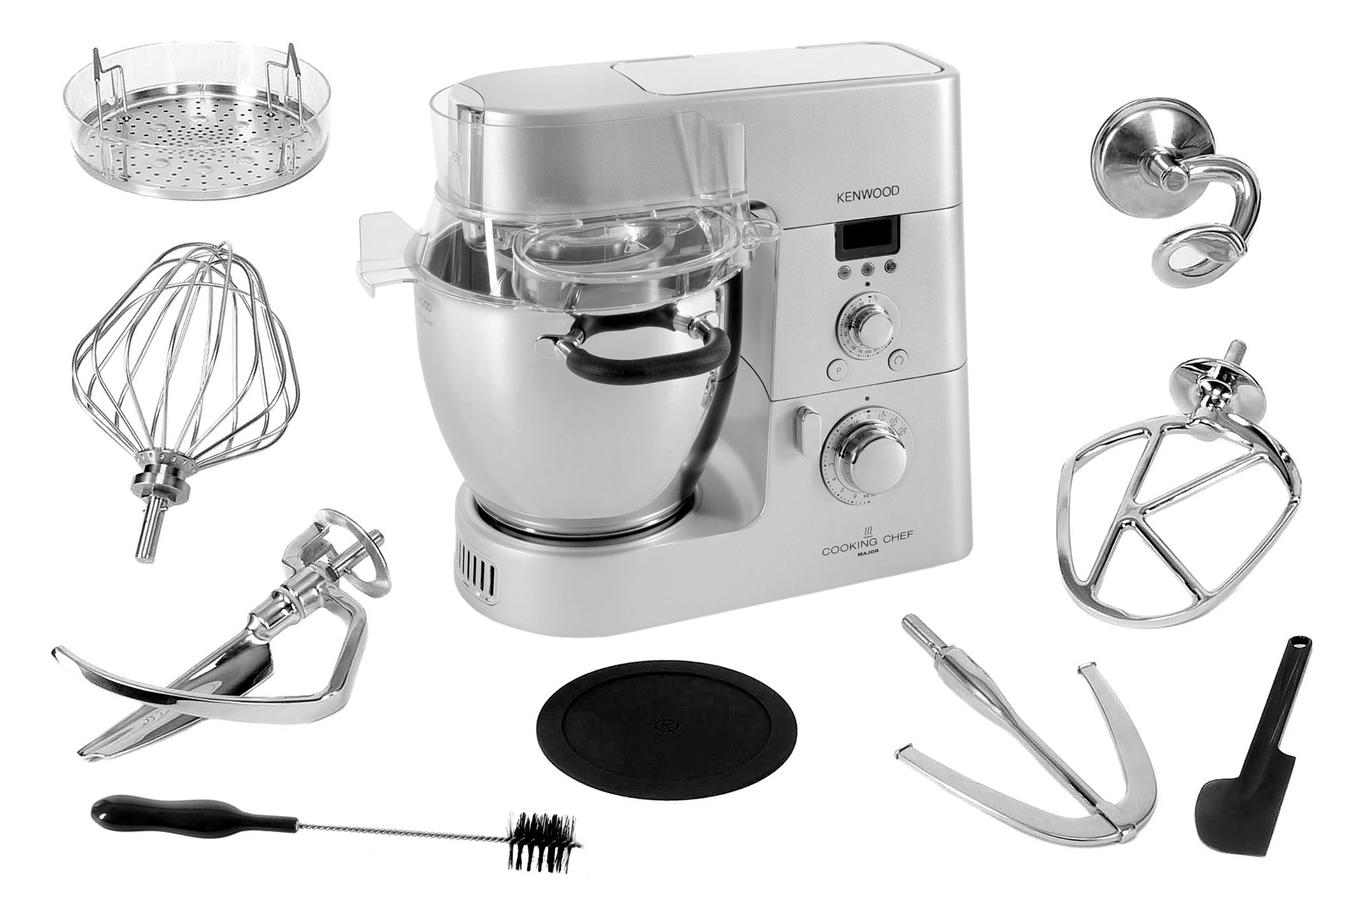 robot cuiseur kenwood km069 cooking chef cookingchef darty. Black Bedroom Furniture Sets. Home Design Ideas